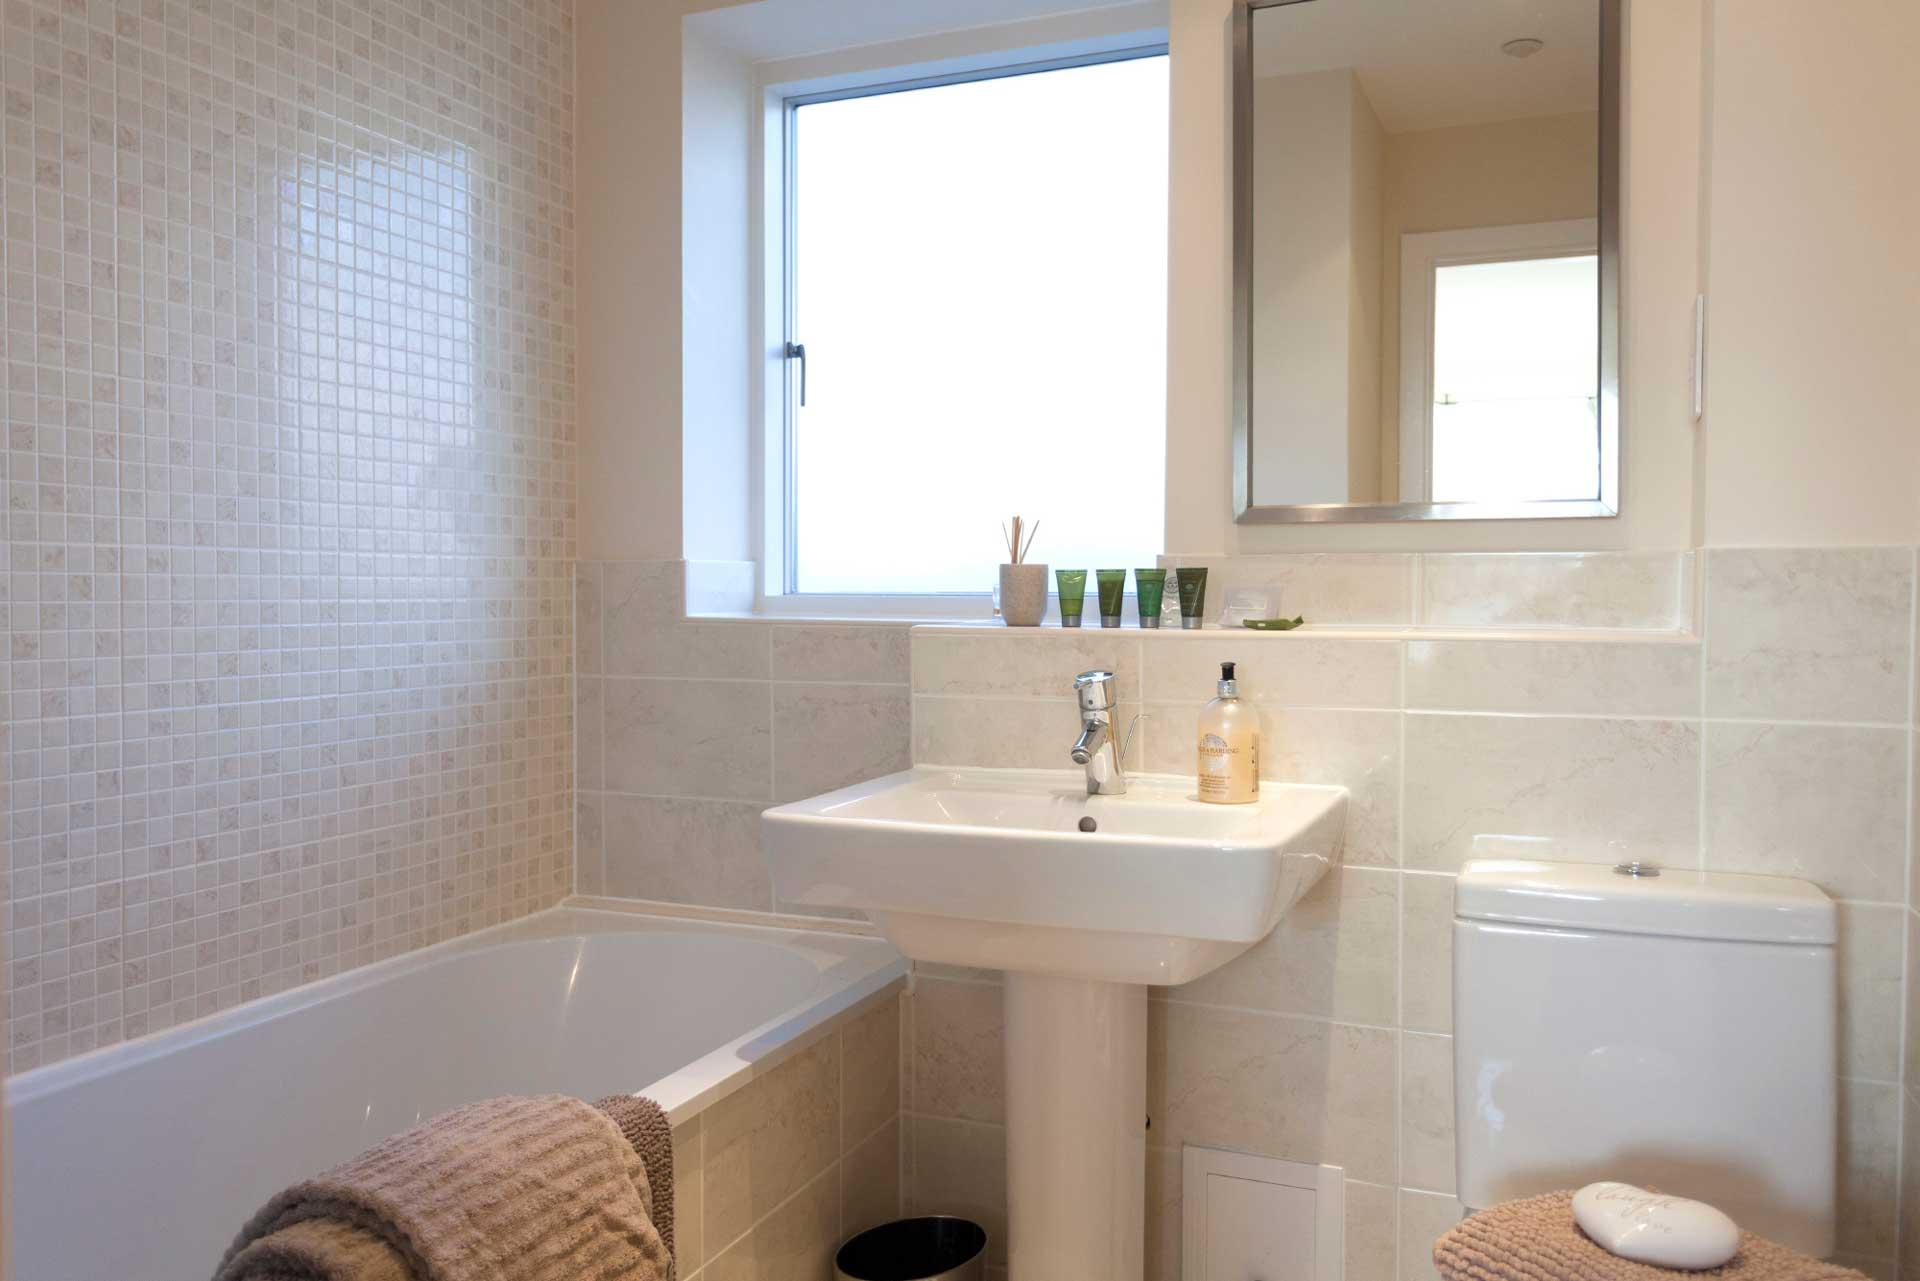 Howells-Mere-3-Lower-Mill-Estate-Rentals-Bathroom-4a